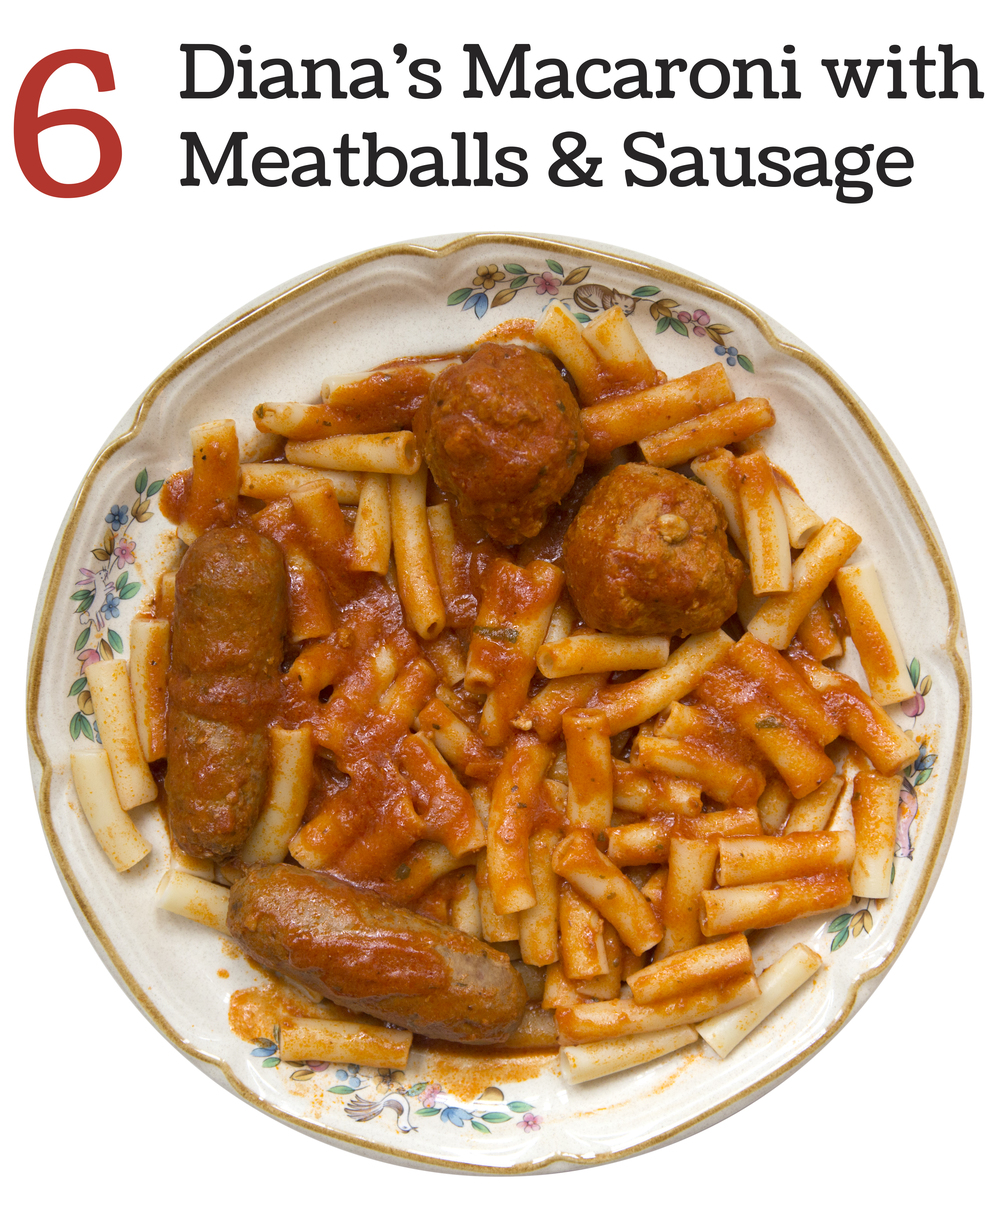 6     Diana's Macaroni with Meatballs & Sausage